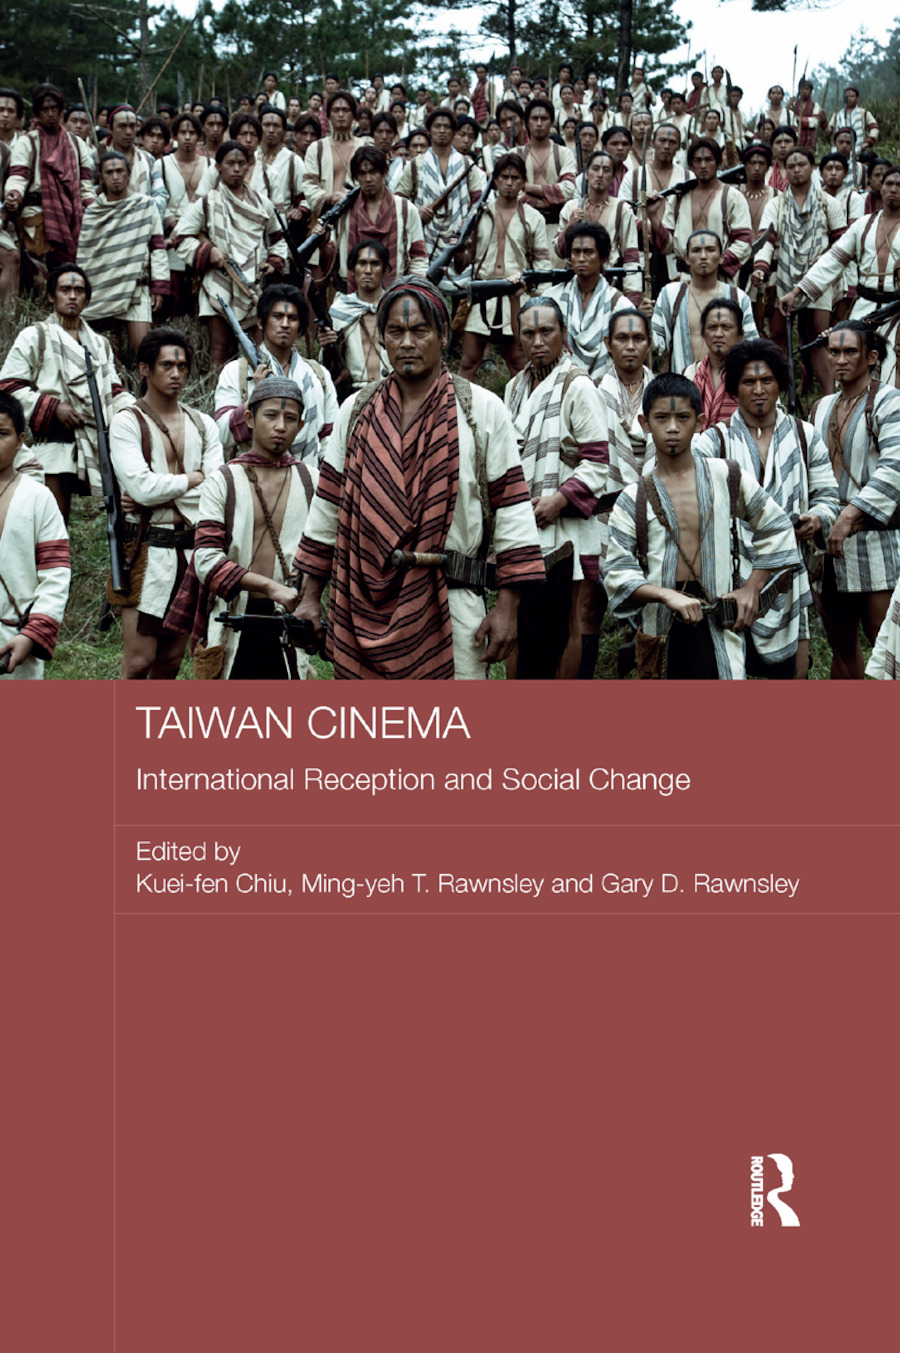 Taiwan Cinema: International Reception and Social Change book cover